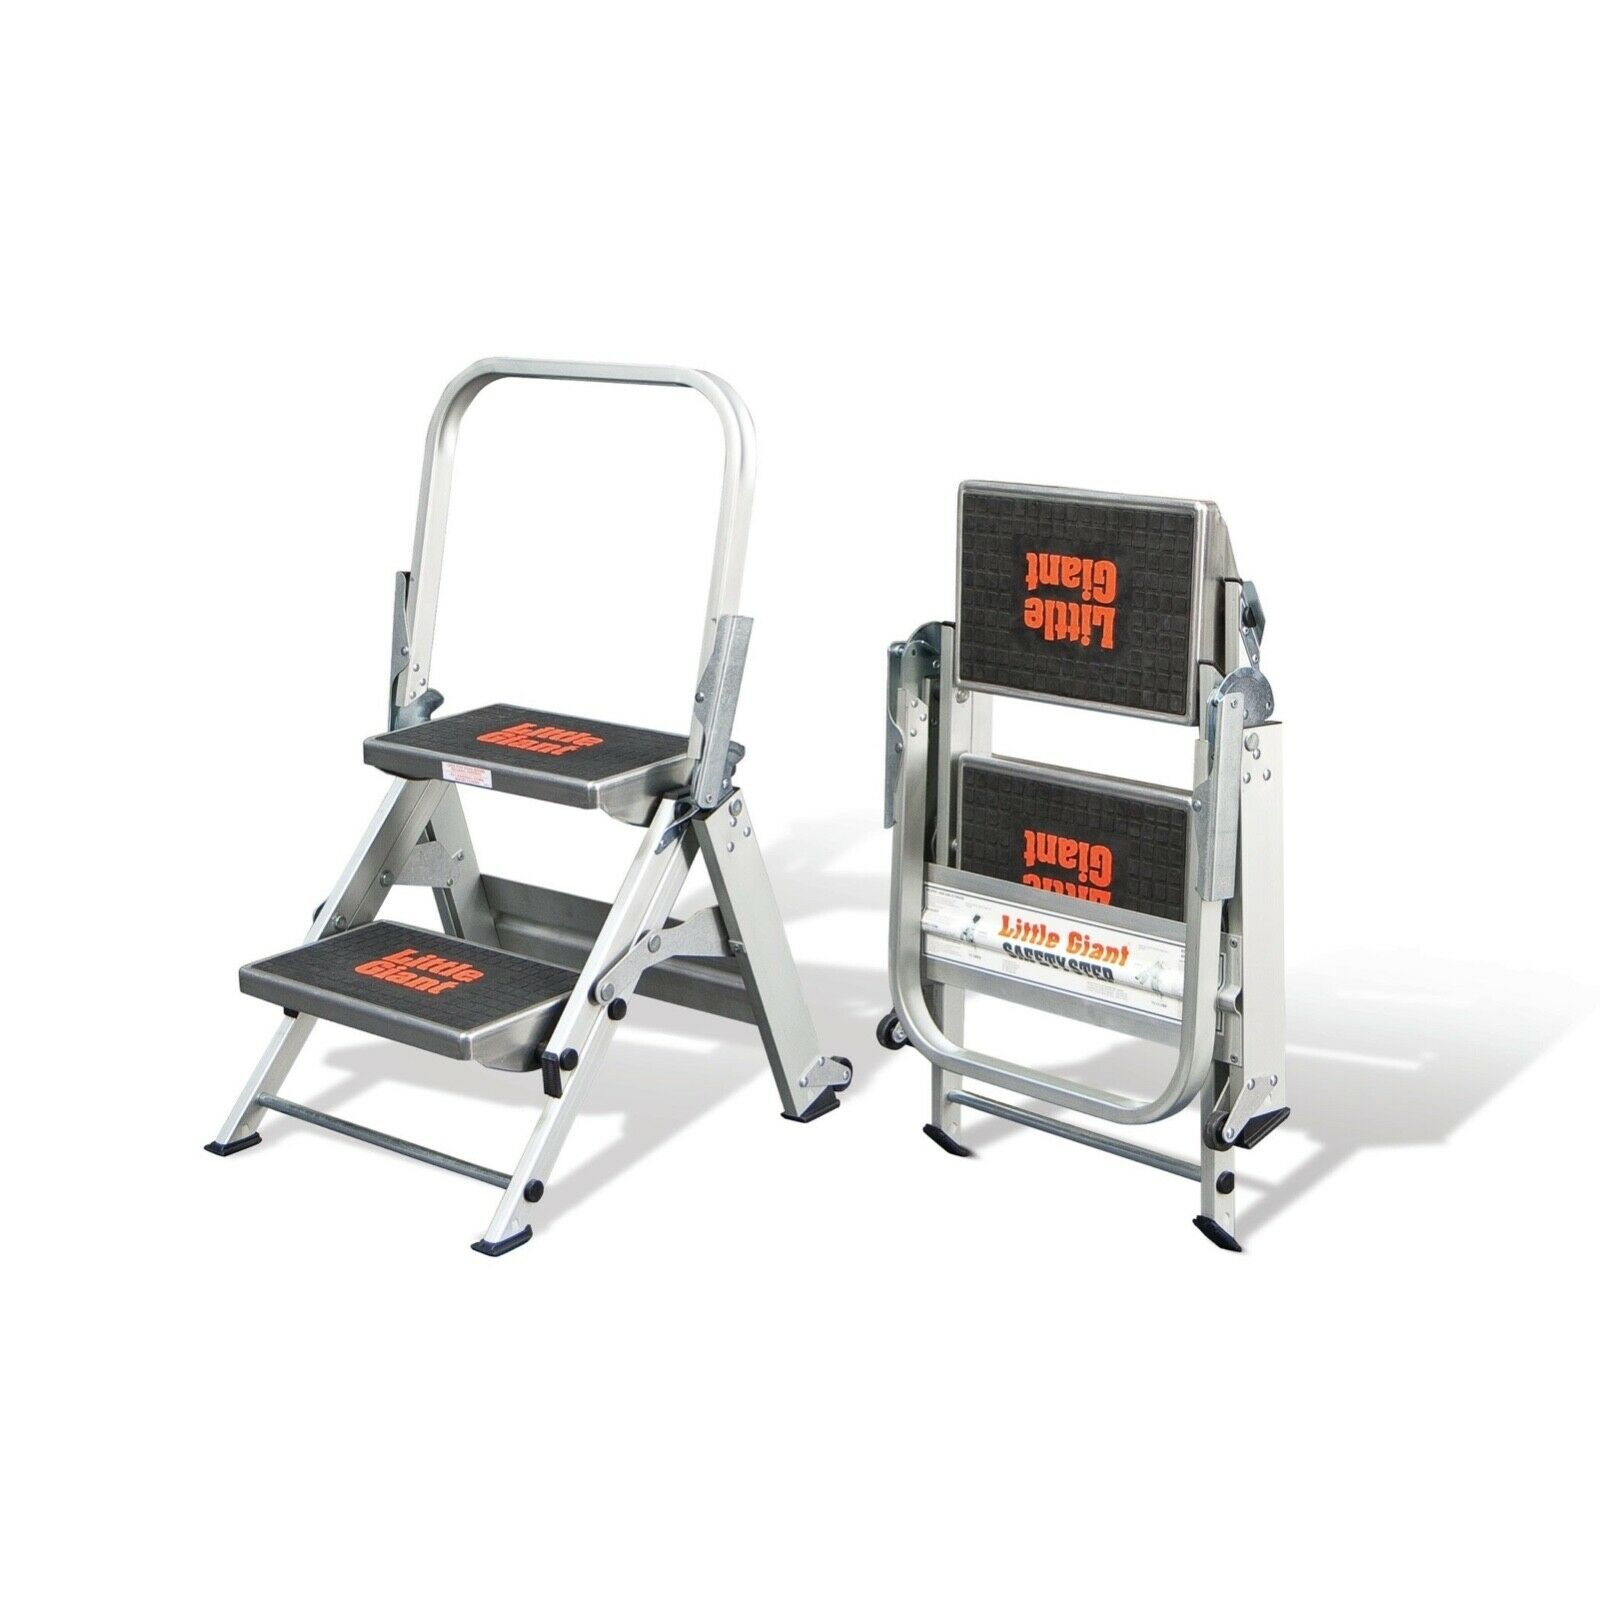 Little Giant 2-Step 300 lbs. Capacity Aluminum Foldable Step